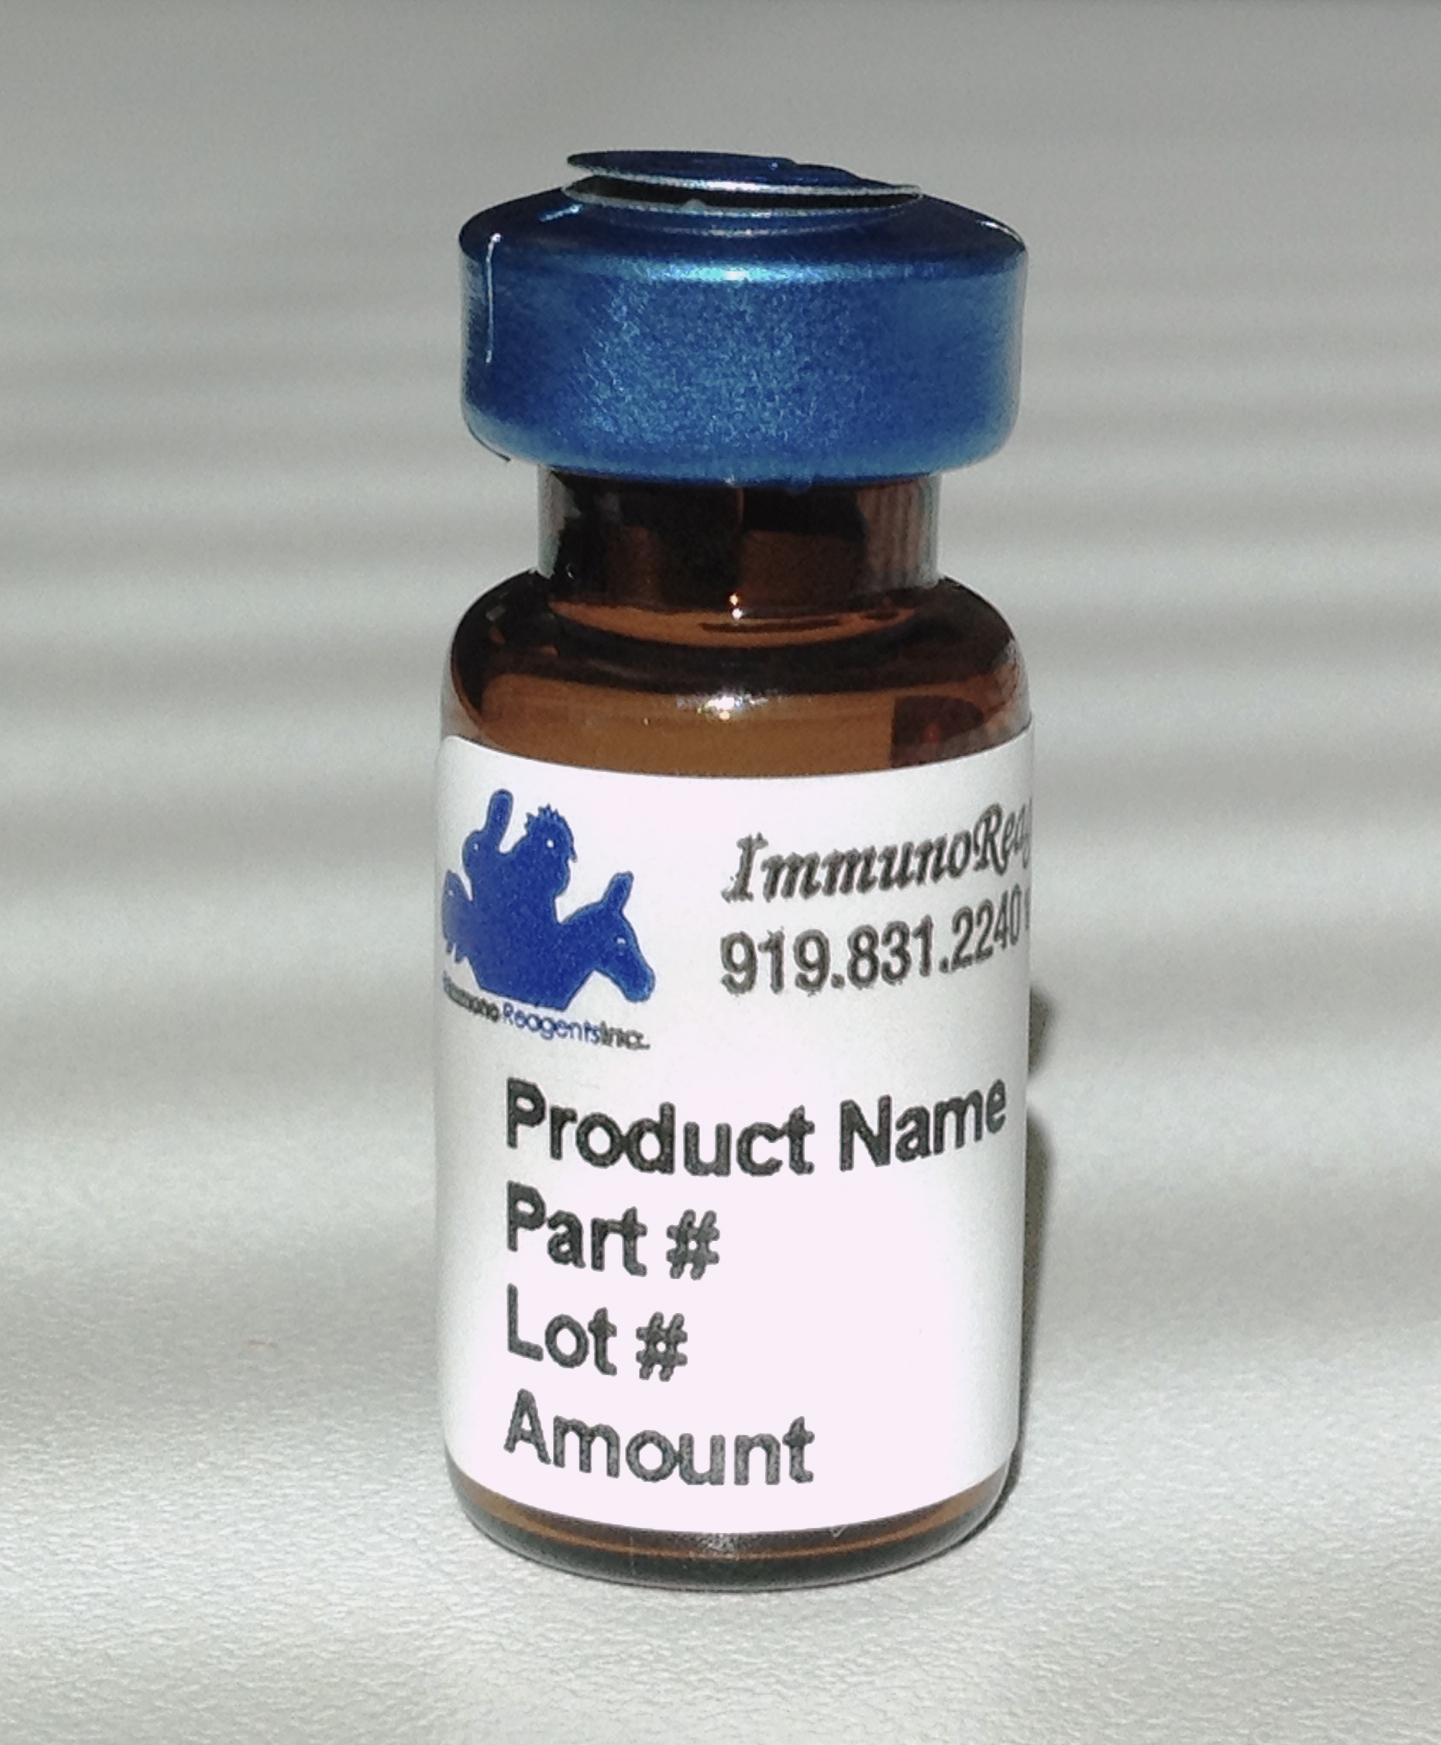 immunoreagents/Goat anti-Bovine IgG (H&L) - Affinity Pure/2.0 mg/GtxBo-003-D